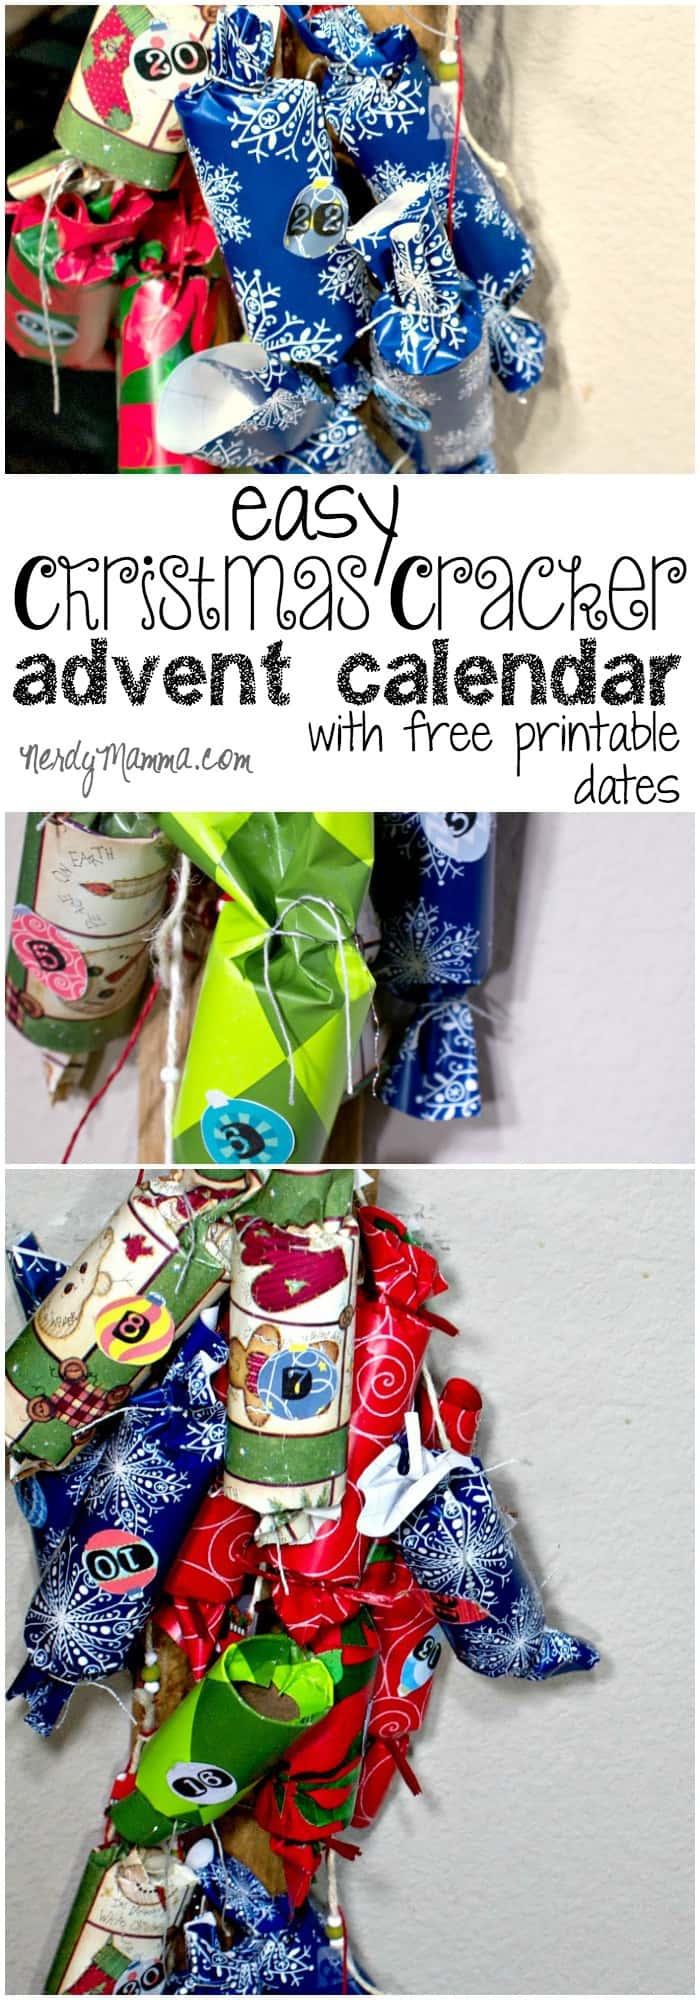 Christmas Calendar Self Made : Easy christmas cracker advent calendar with free printable